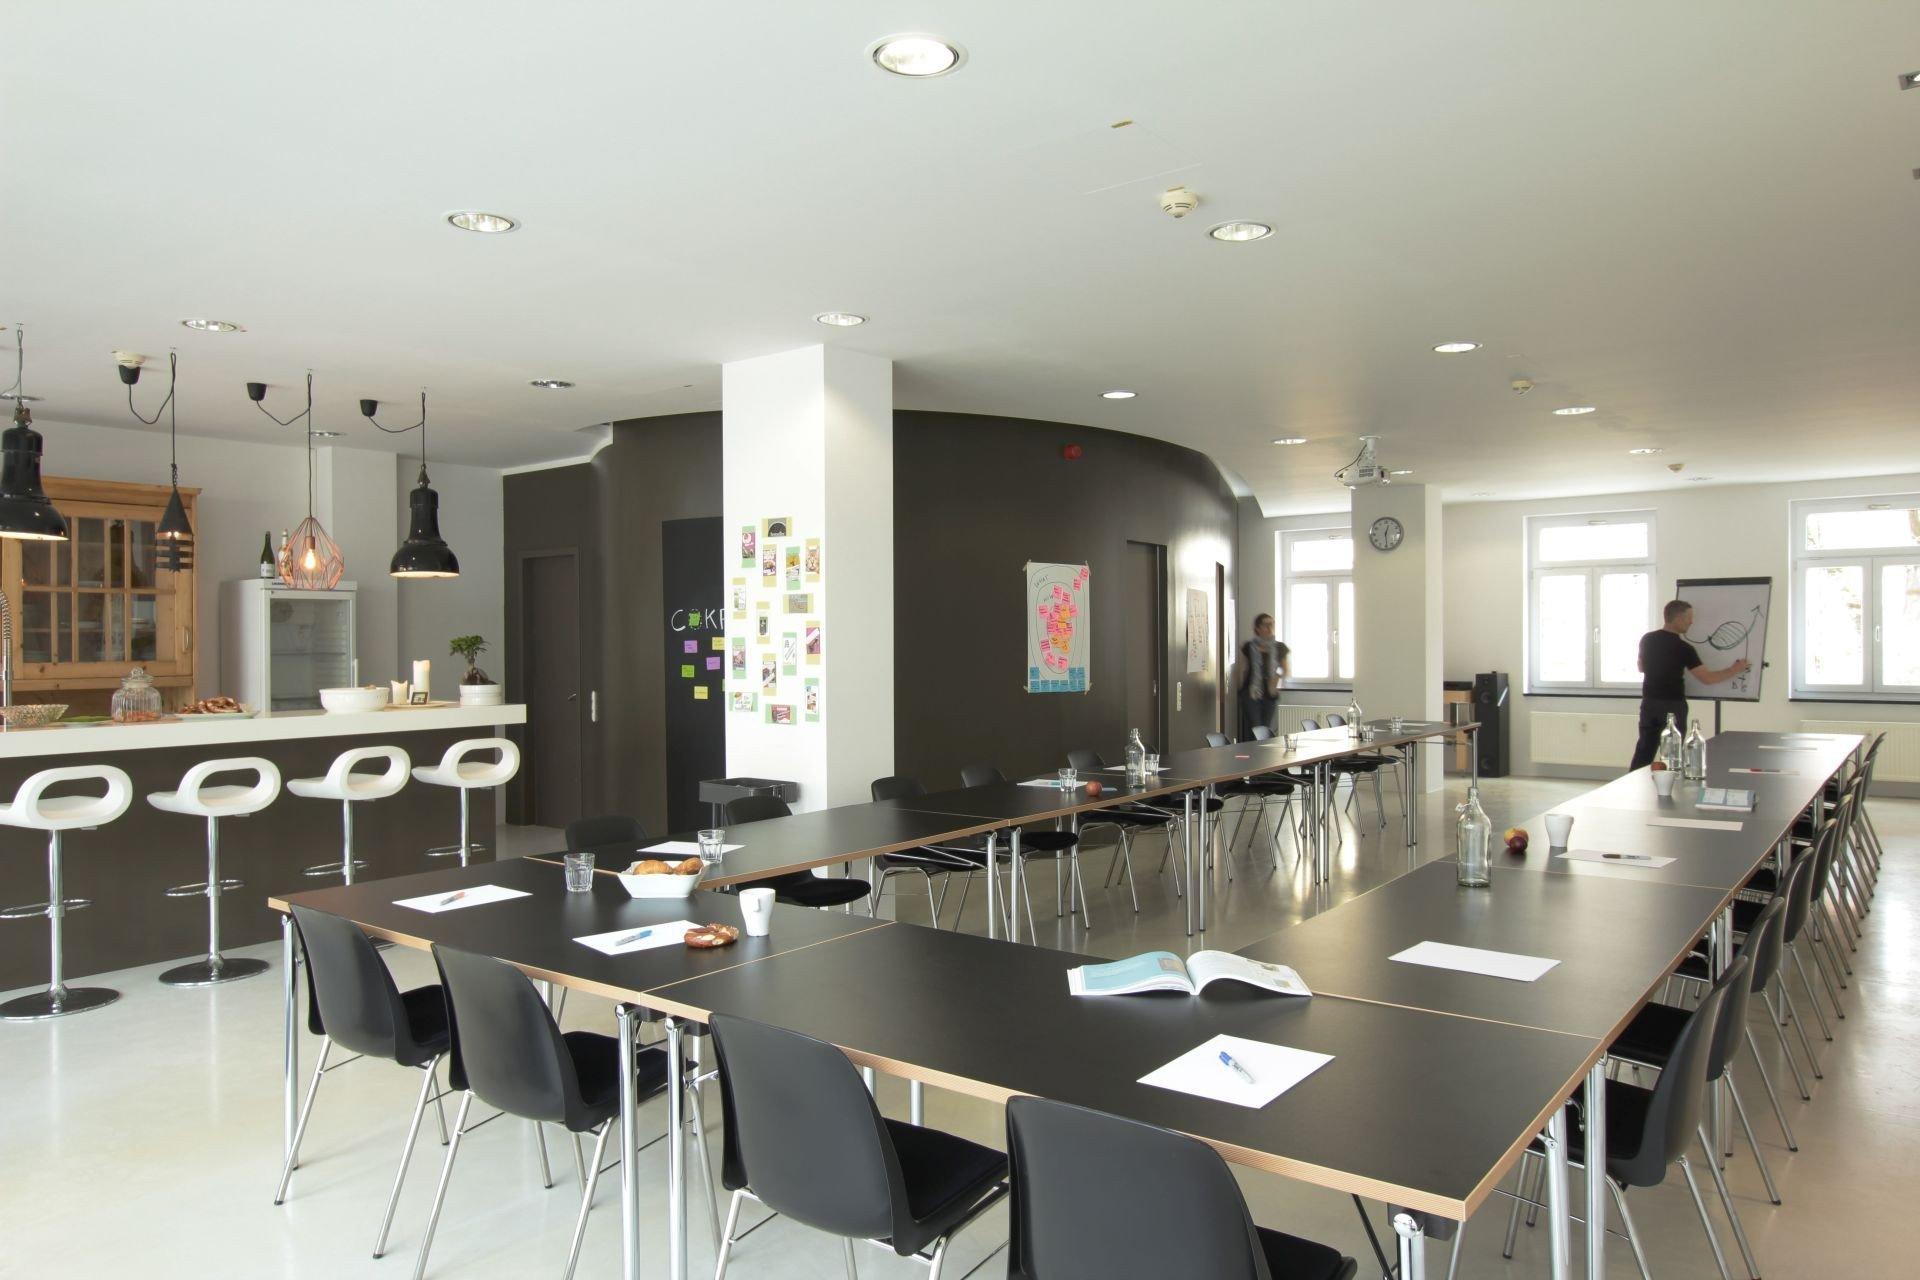 Munich  Salle de réunion COKREA - super attractive location for workshops and seminars. image 27